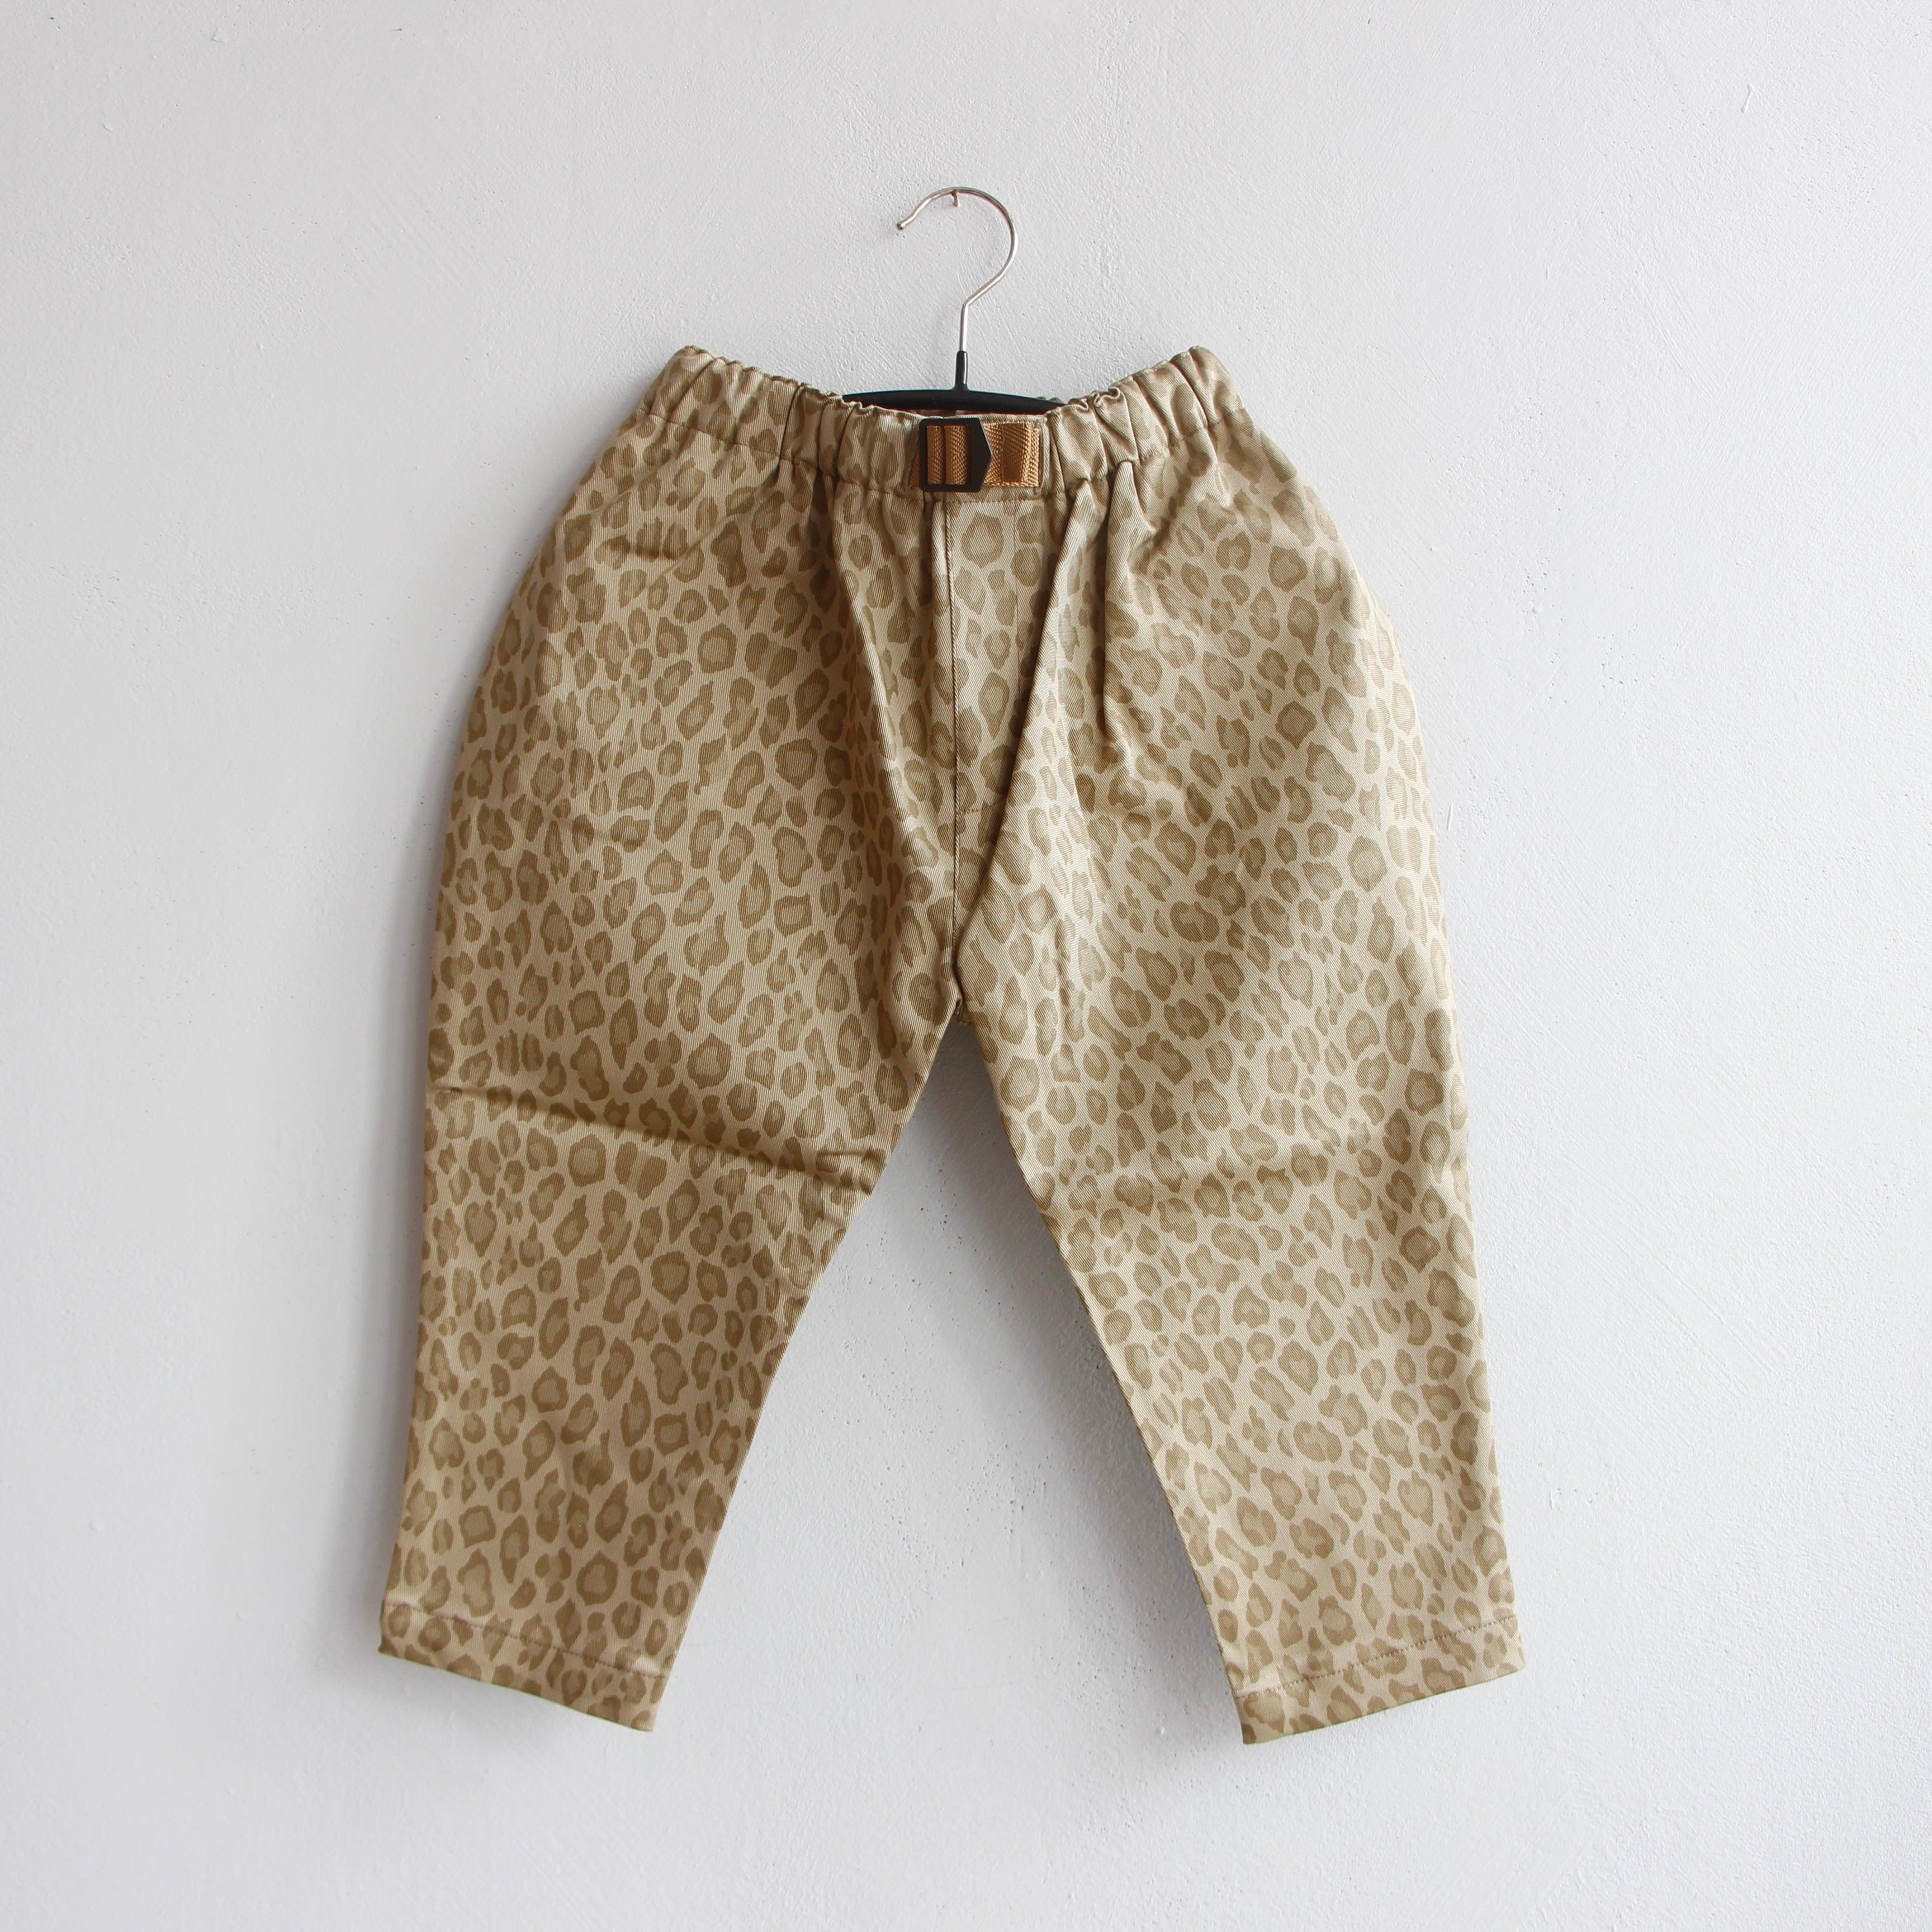 《eLfinFolk 2021AW》Snow leopard  pants / beige / 140-150cm